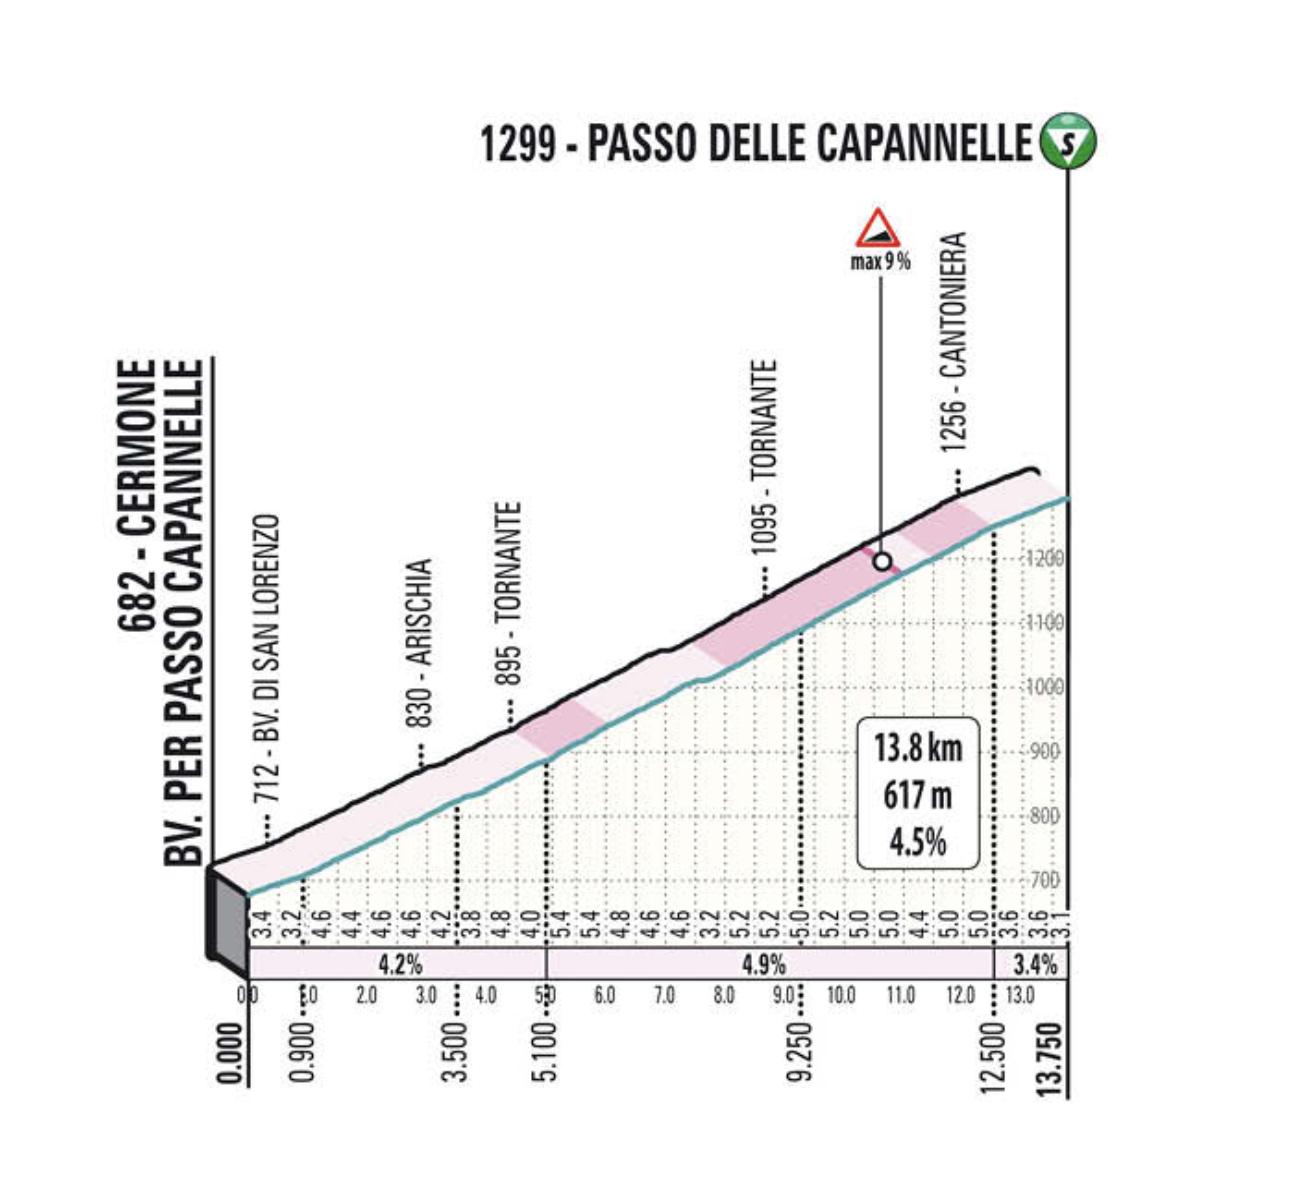 Tirreno 2021 stage 4 climb profile 1